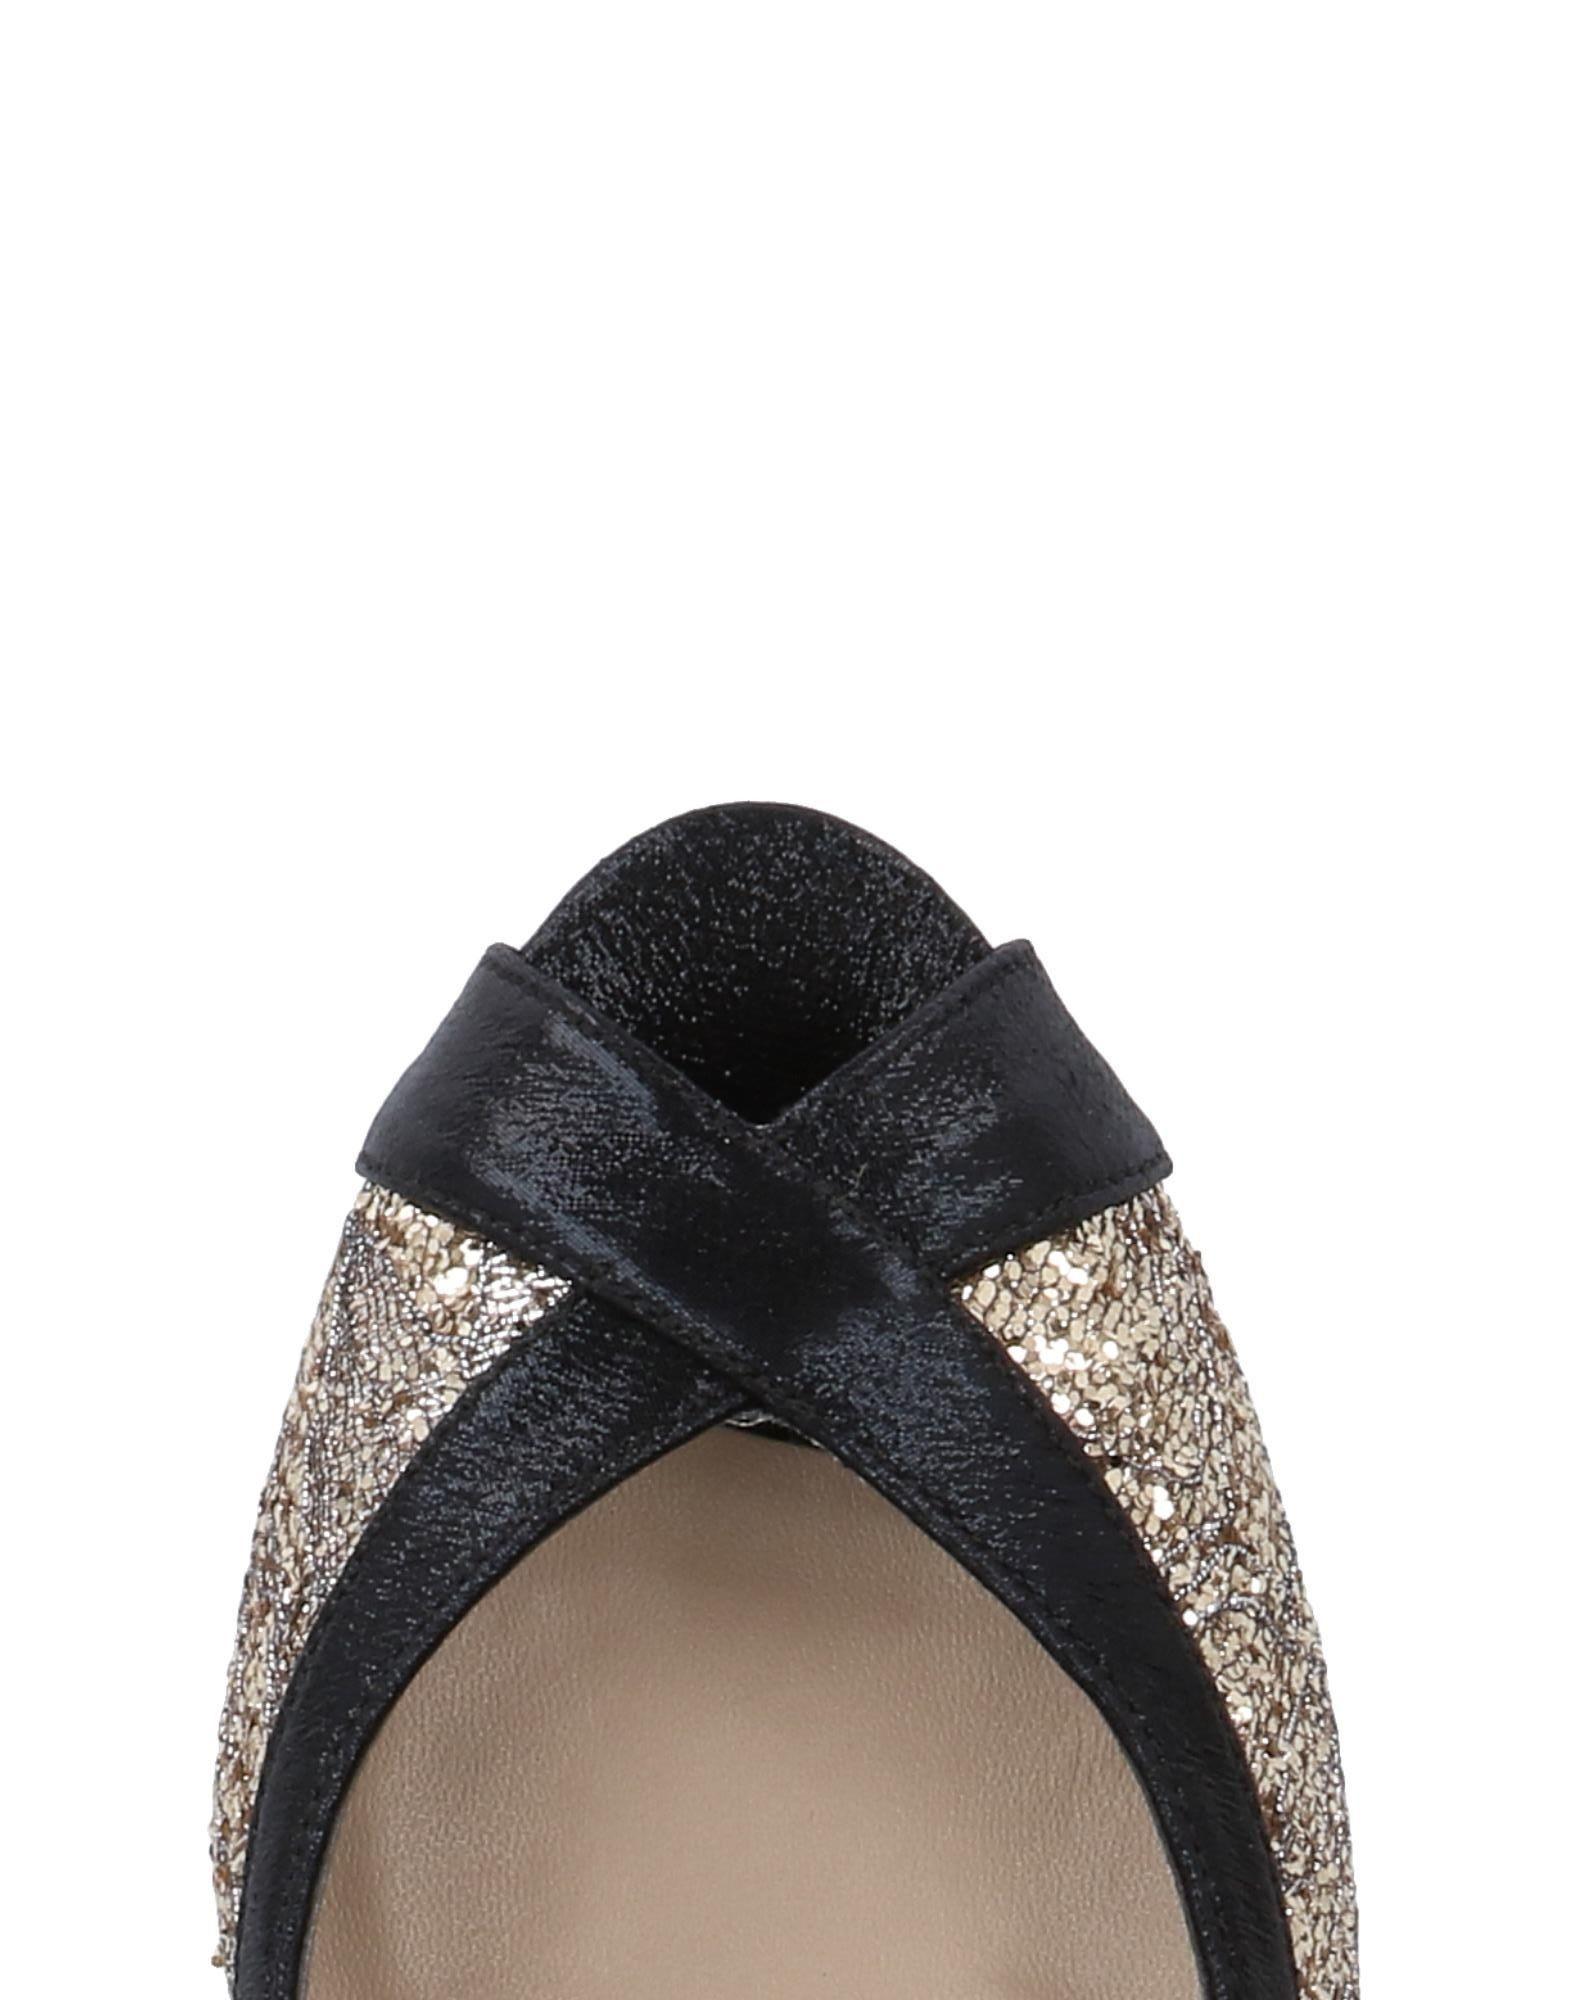 Menbur Gute Pumps Damen  11498483DQ Gute Menbur Qualität beliebte Schuhe 23e40c